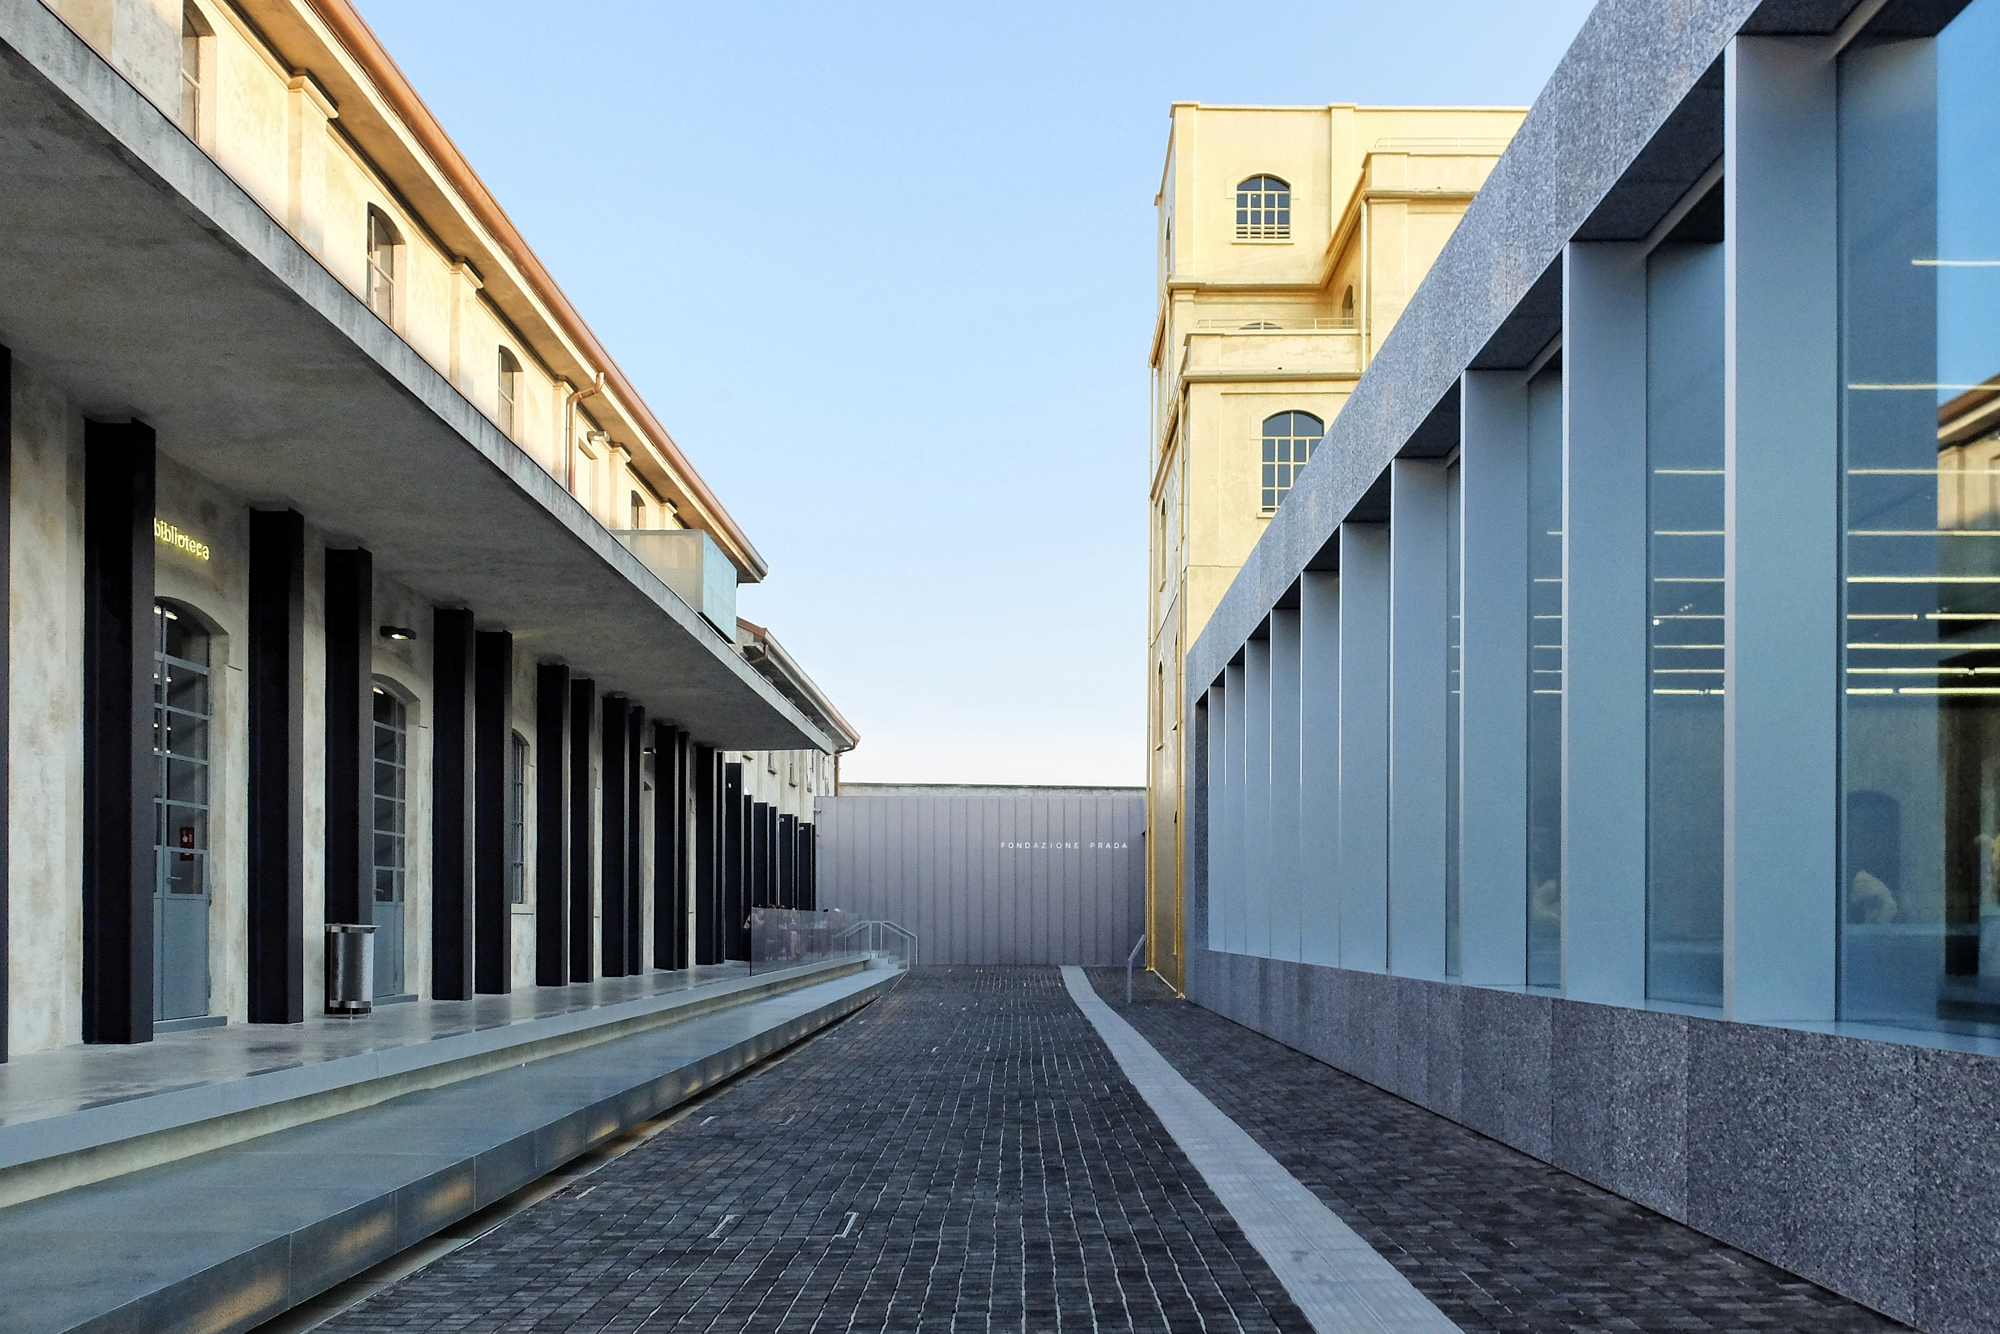 Where OMAs Fondazione Prada Comes Up Short  Architect